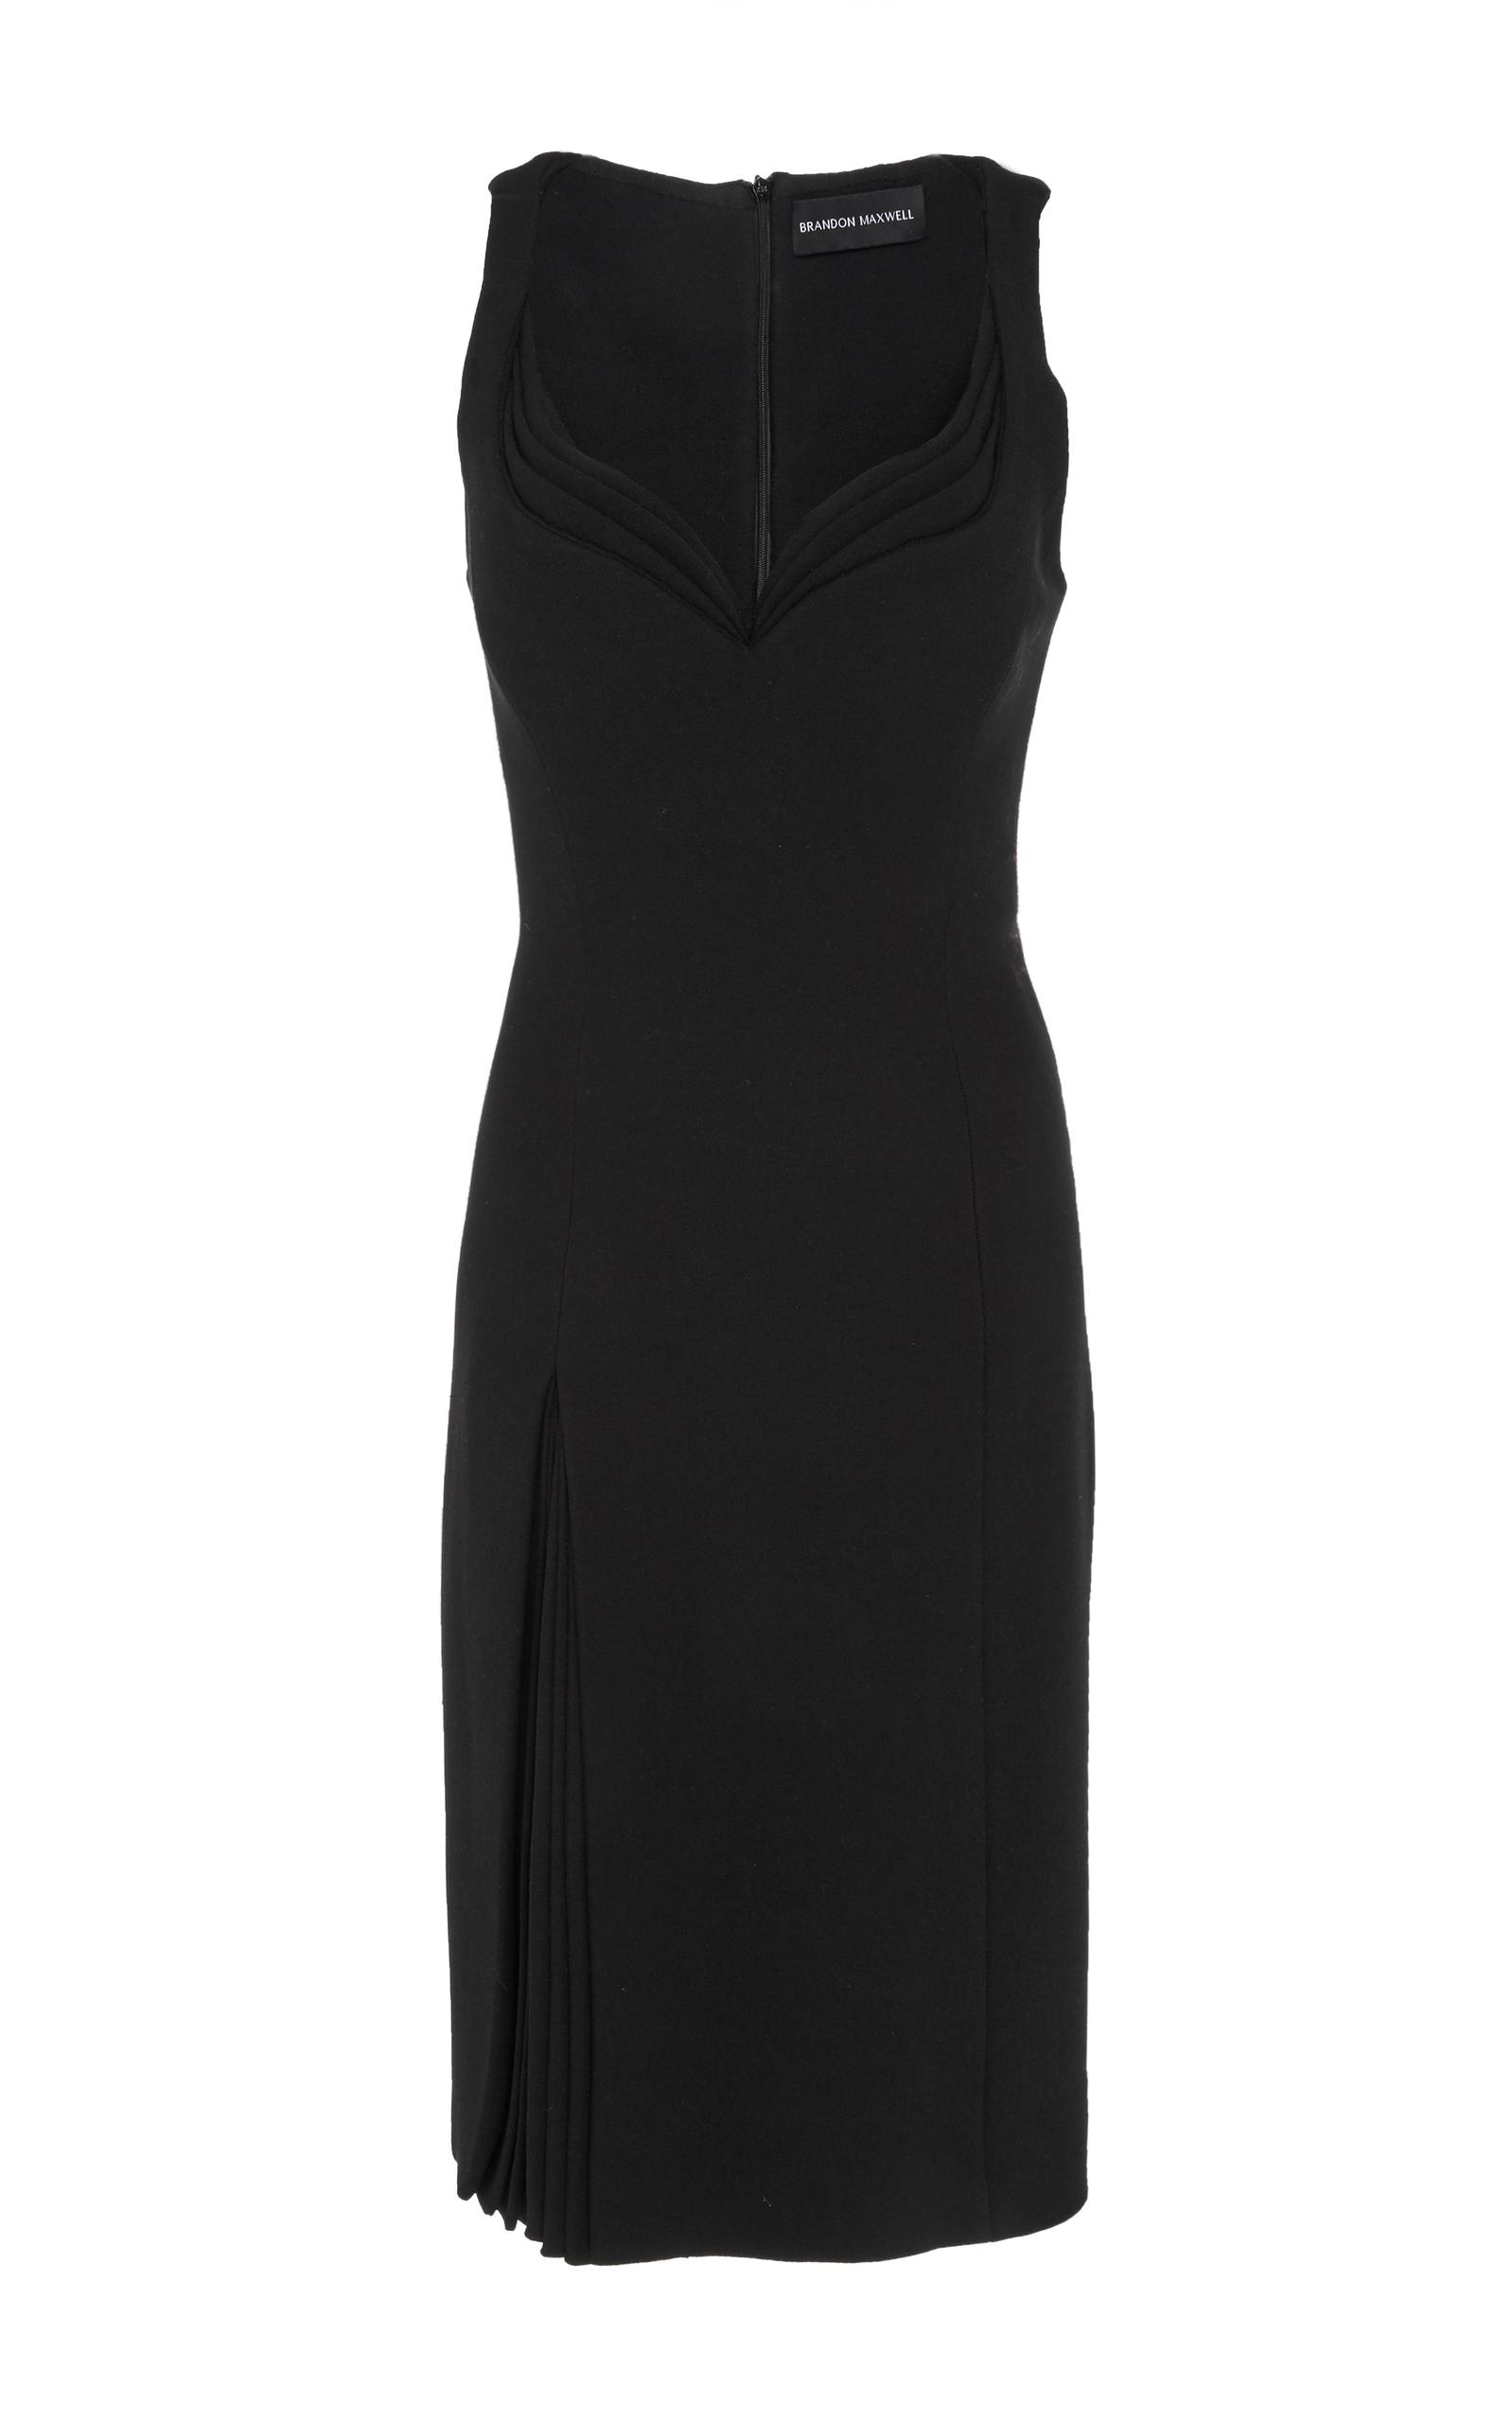 d9350679e9a Brandon MaxwellSweetheart Slit Dress. CLOSE. Loading